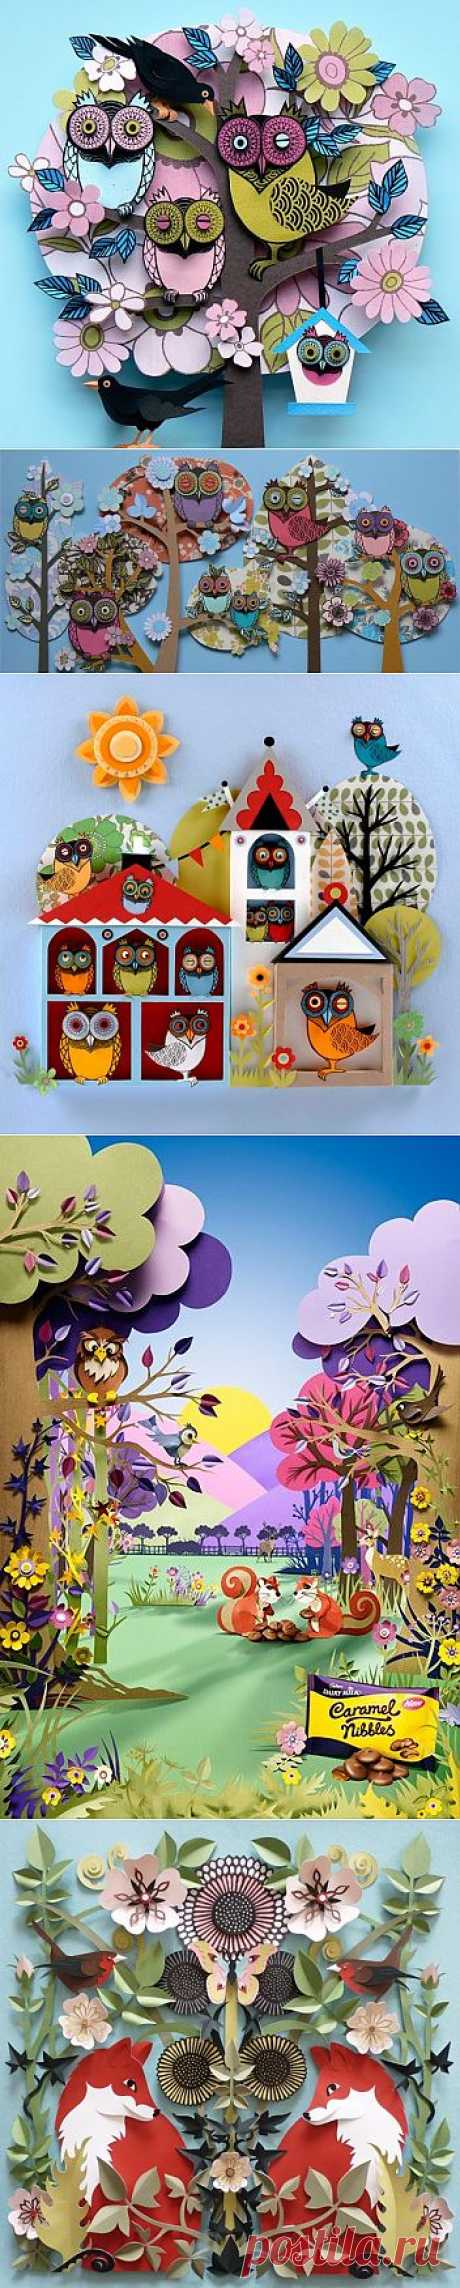 Объемные картины Helen Musselwhite из бумаги (трафик) / Бумага и карандаши (скрапбукинг, оригами, и т.д.) /